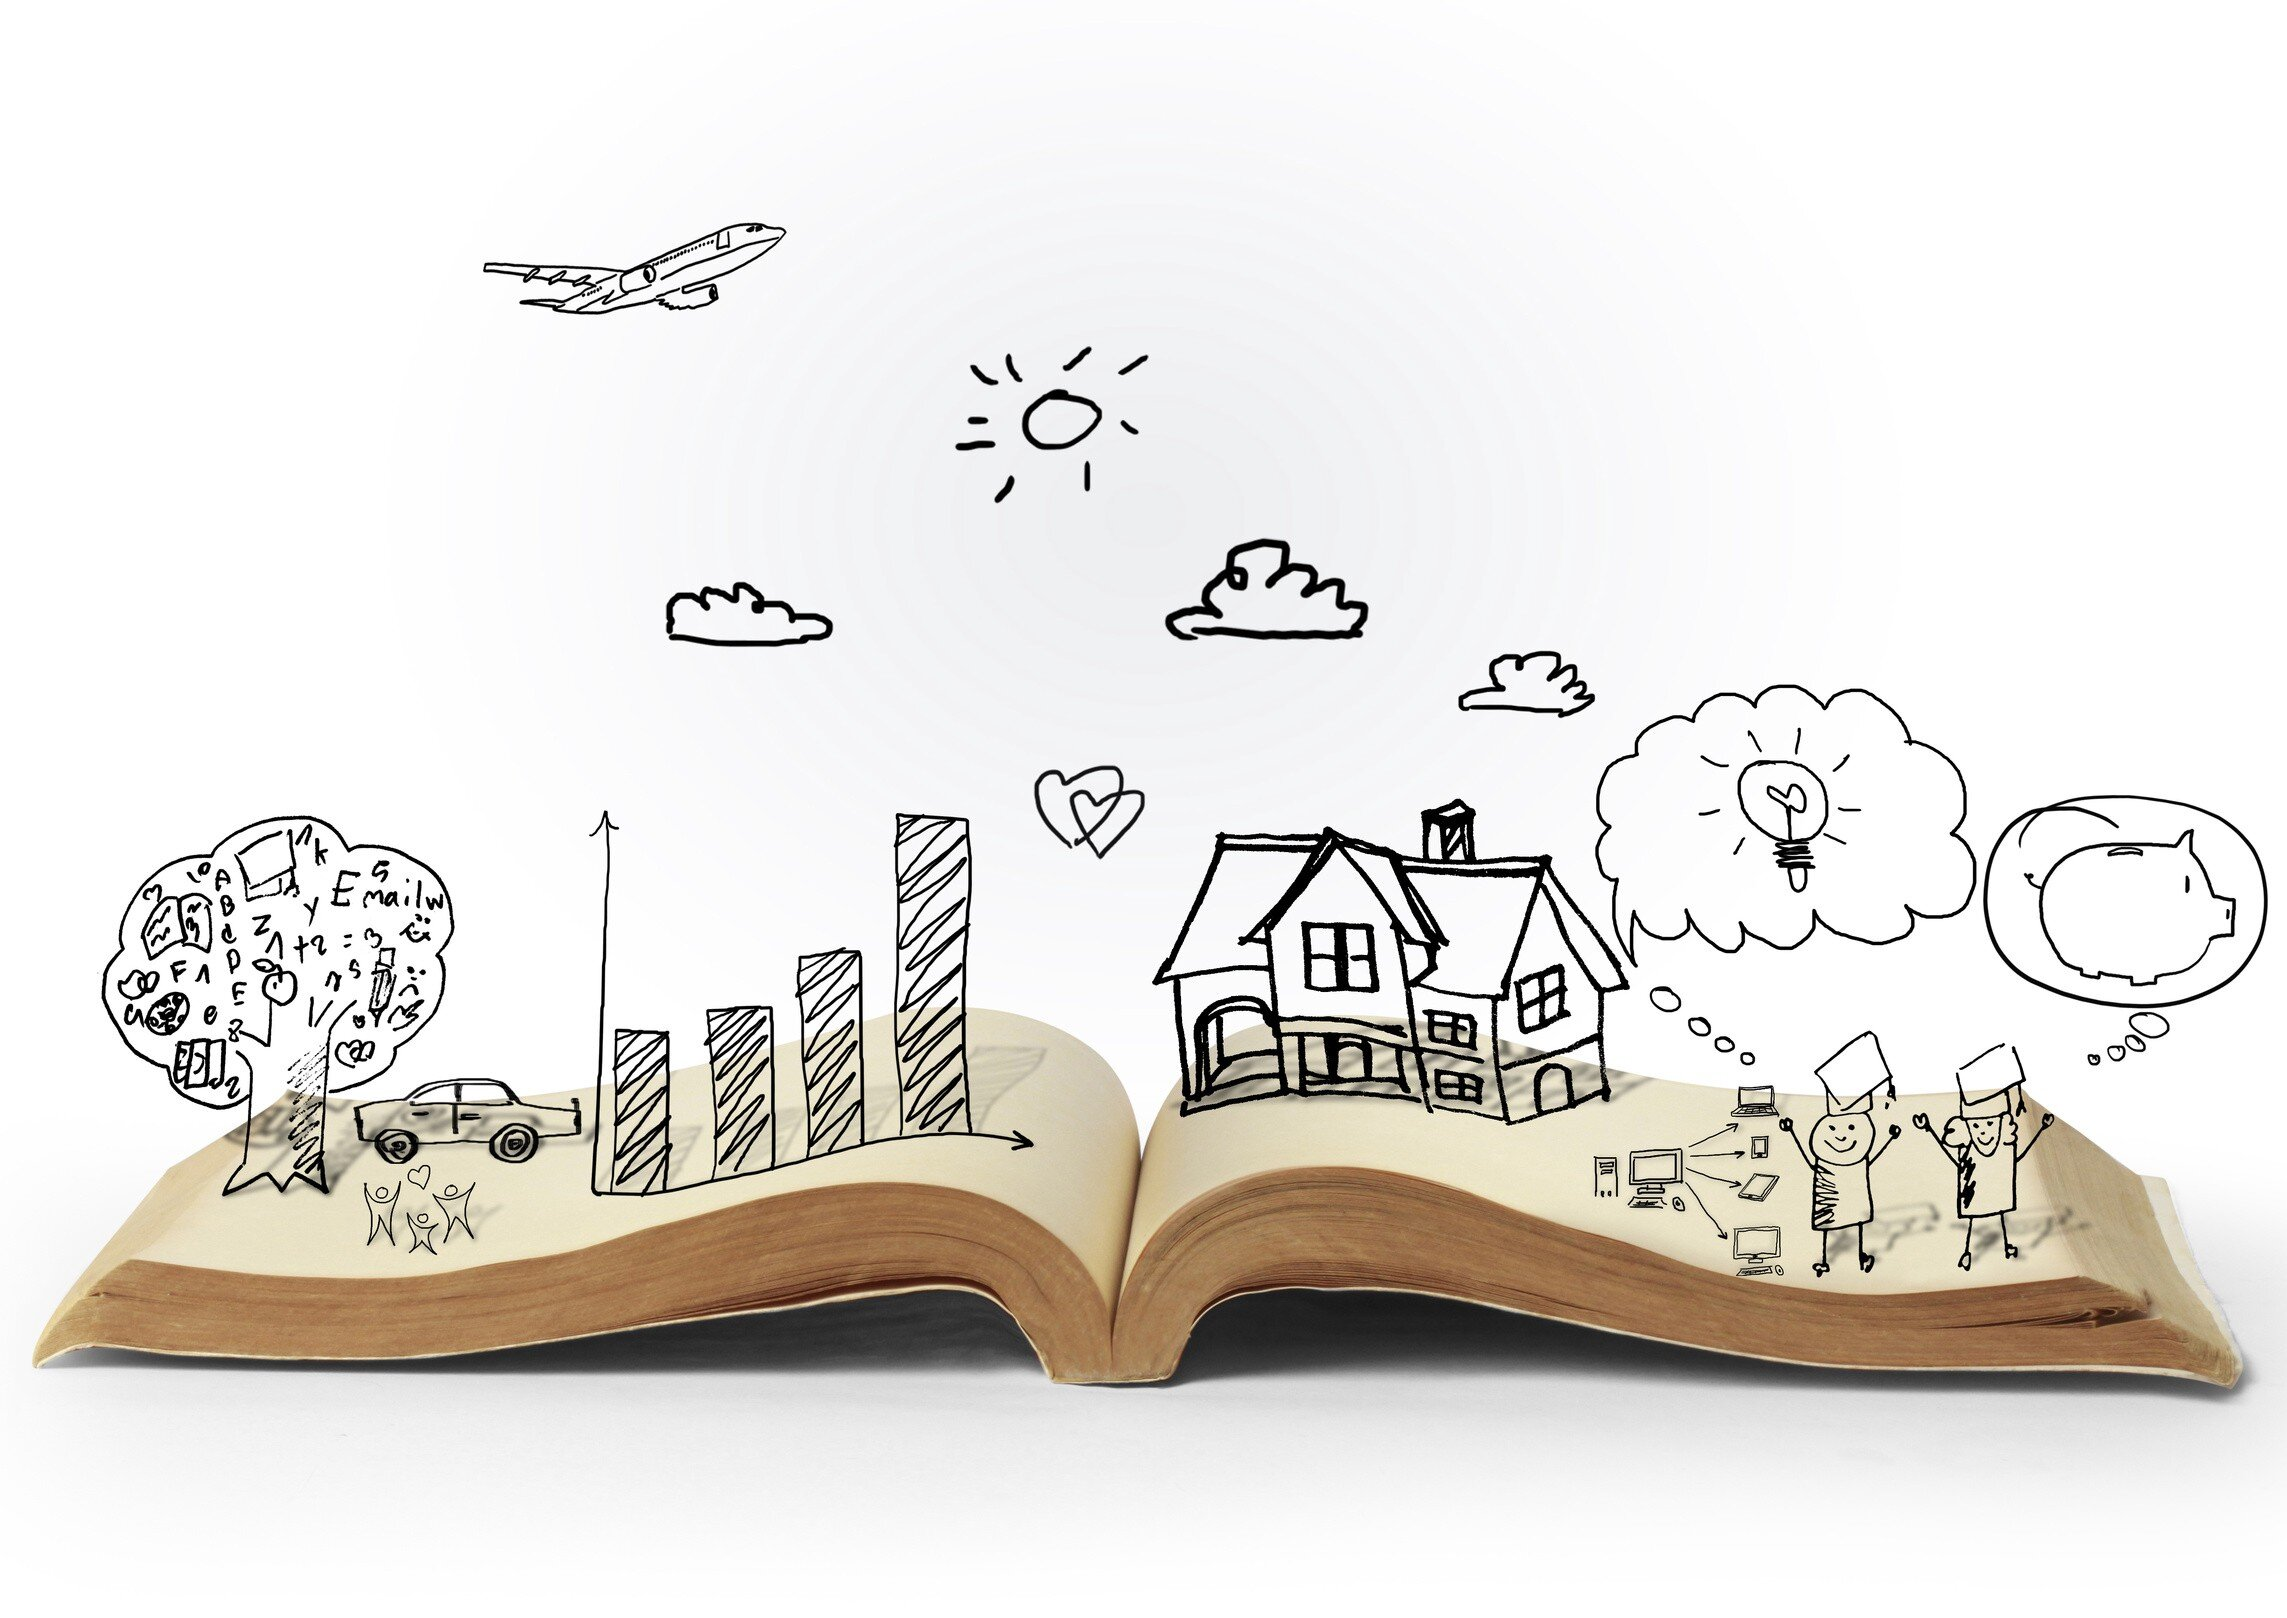 Digital Marketing - Importance Of Storytelling